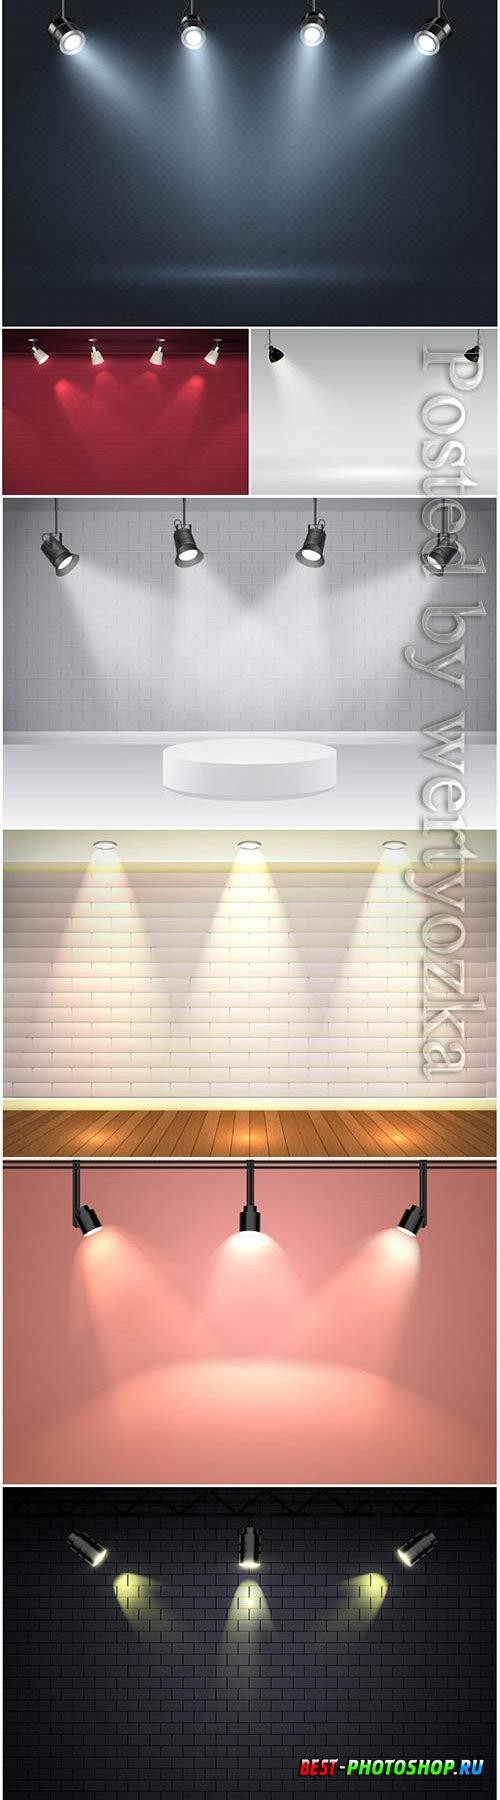 Spot lights background vector illustration